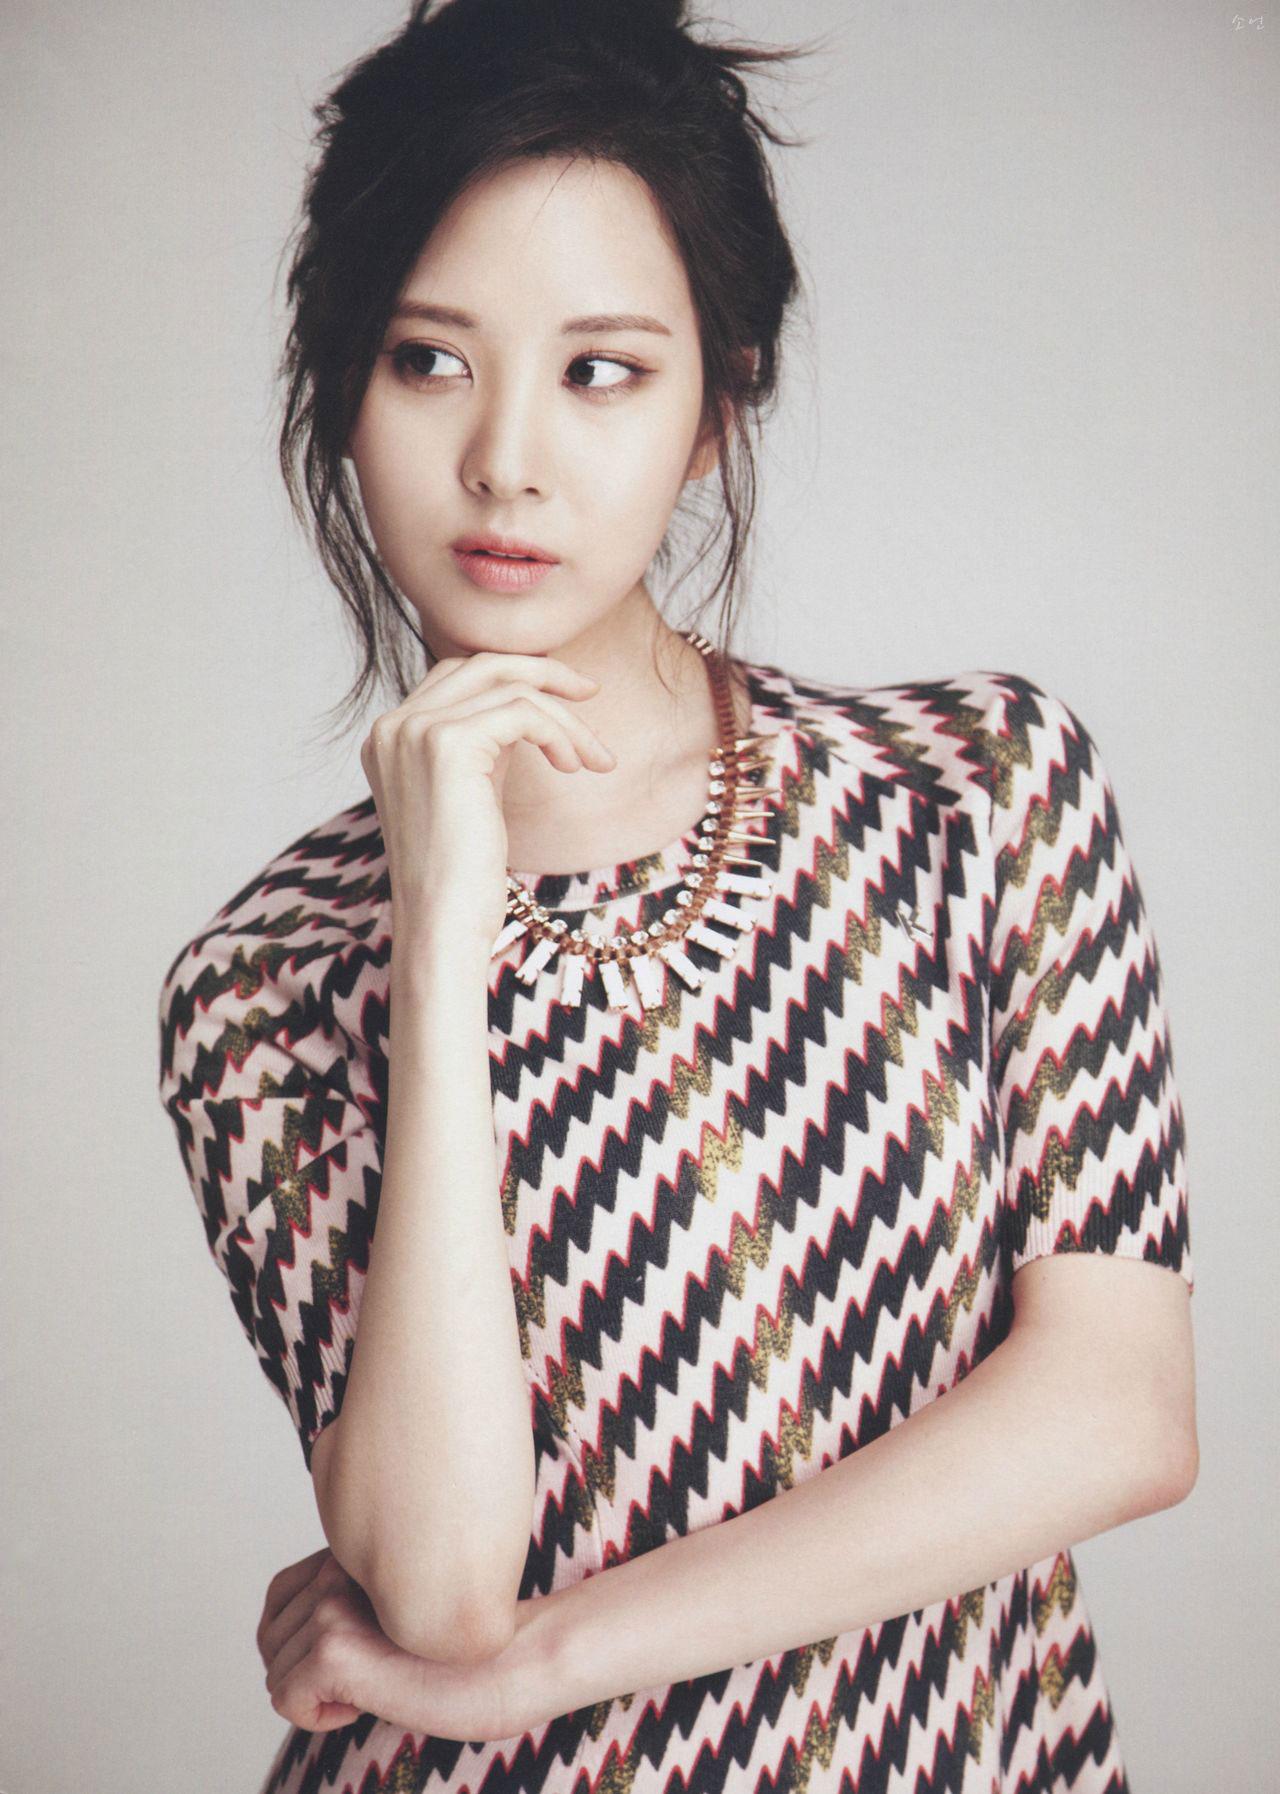 Snsd Seohyun Airport Fashion: Seohyun & Yuri Billboard Korea Kpop Magazine